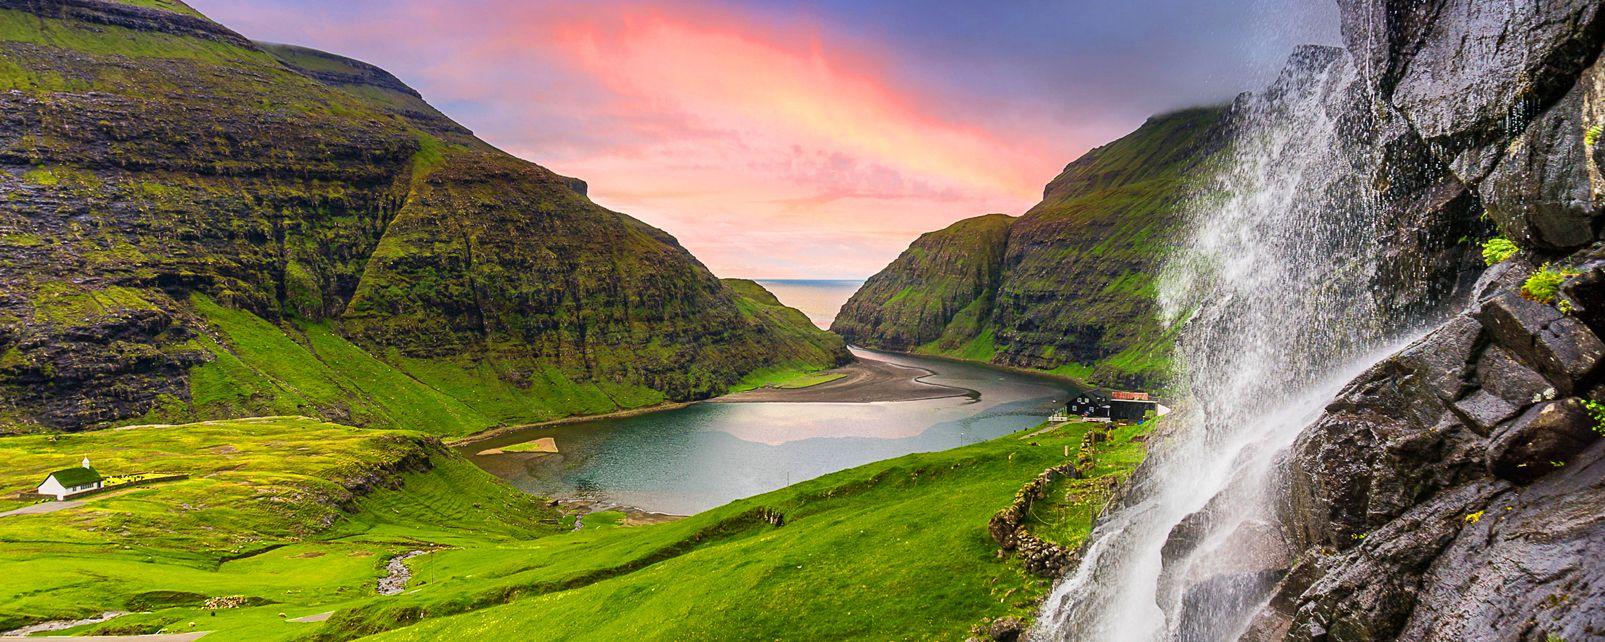 Senderismo en la isla de Streymoy  Islas Feroe